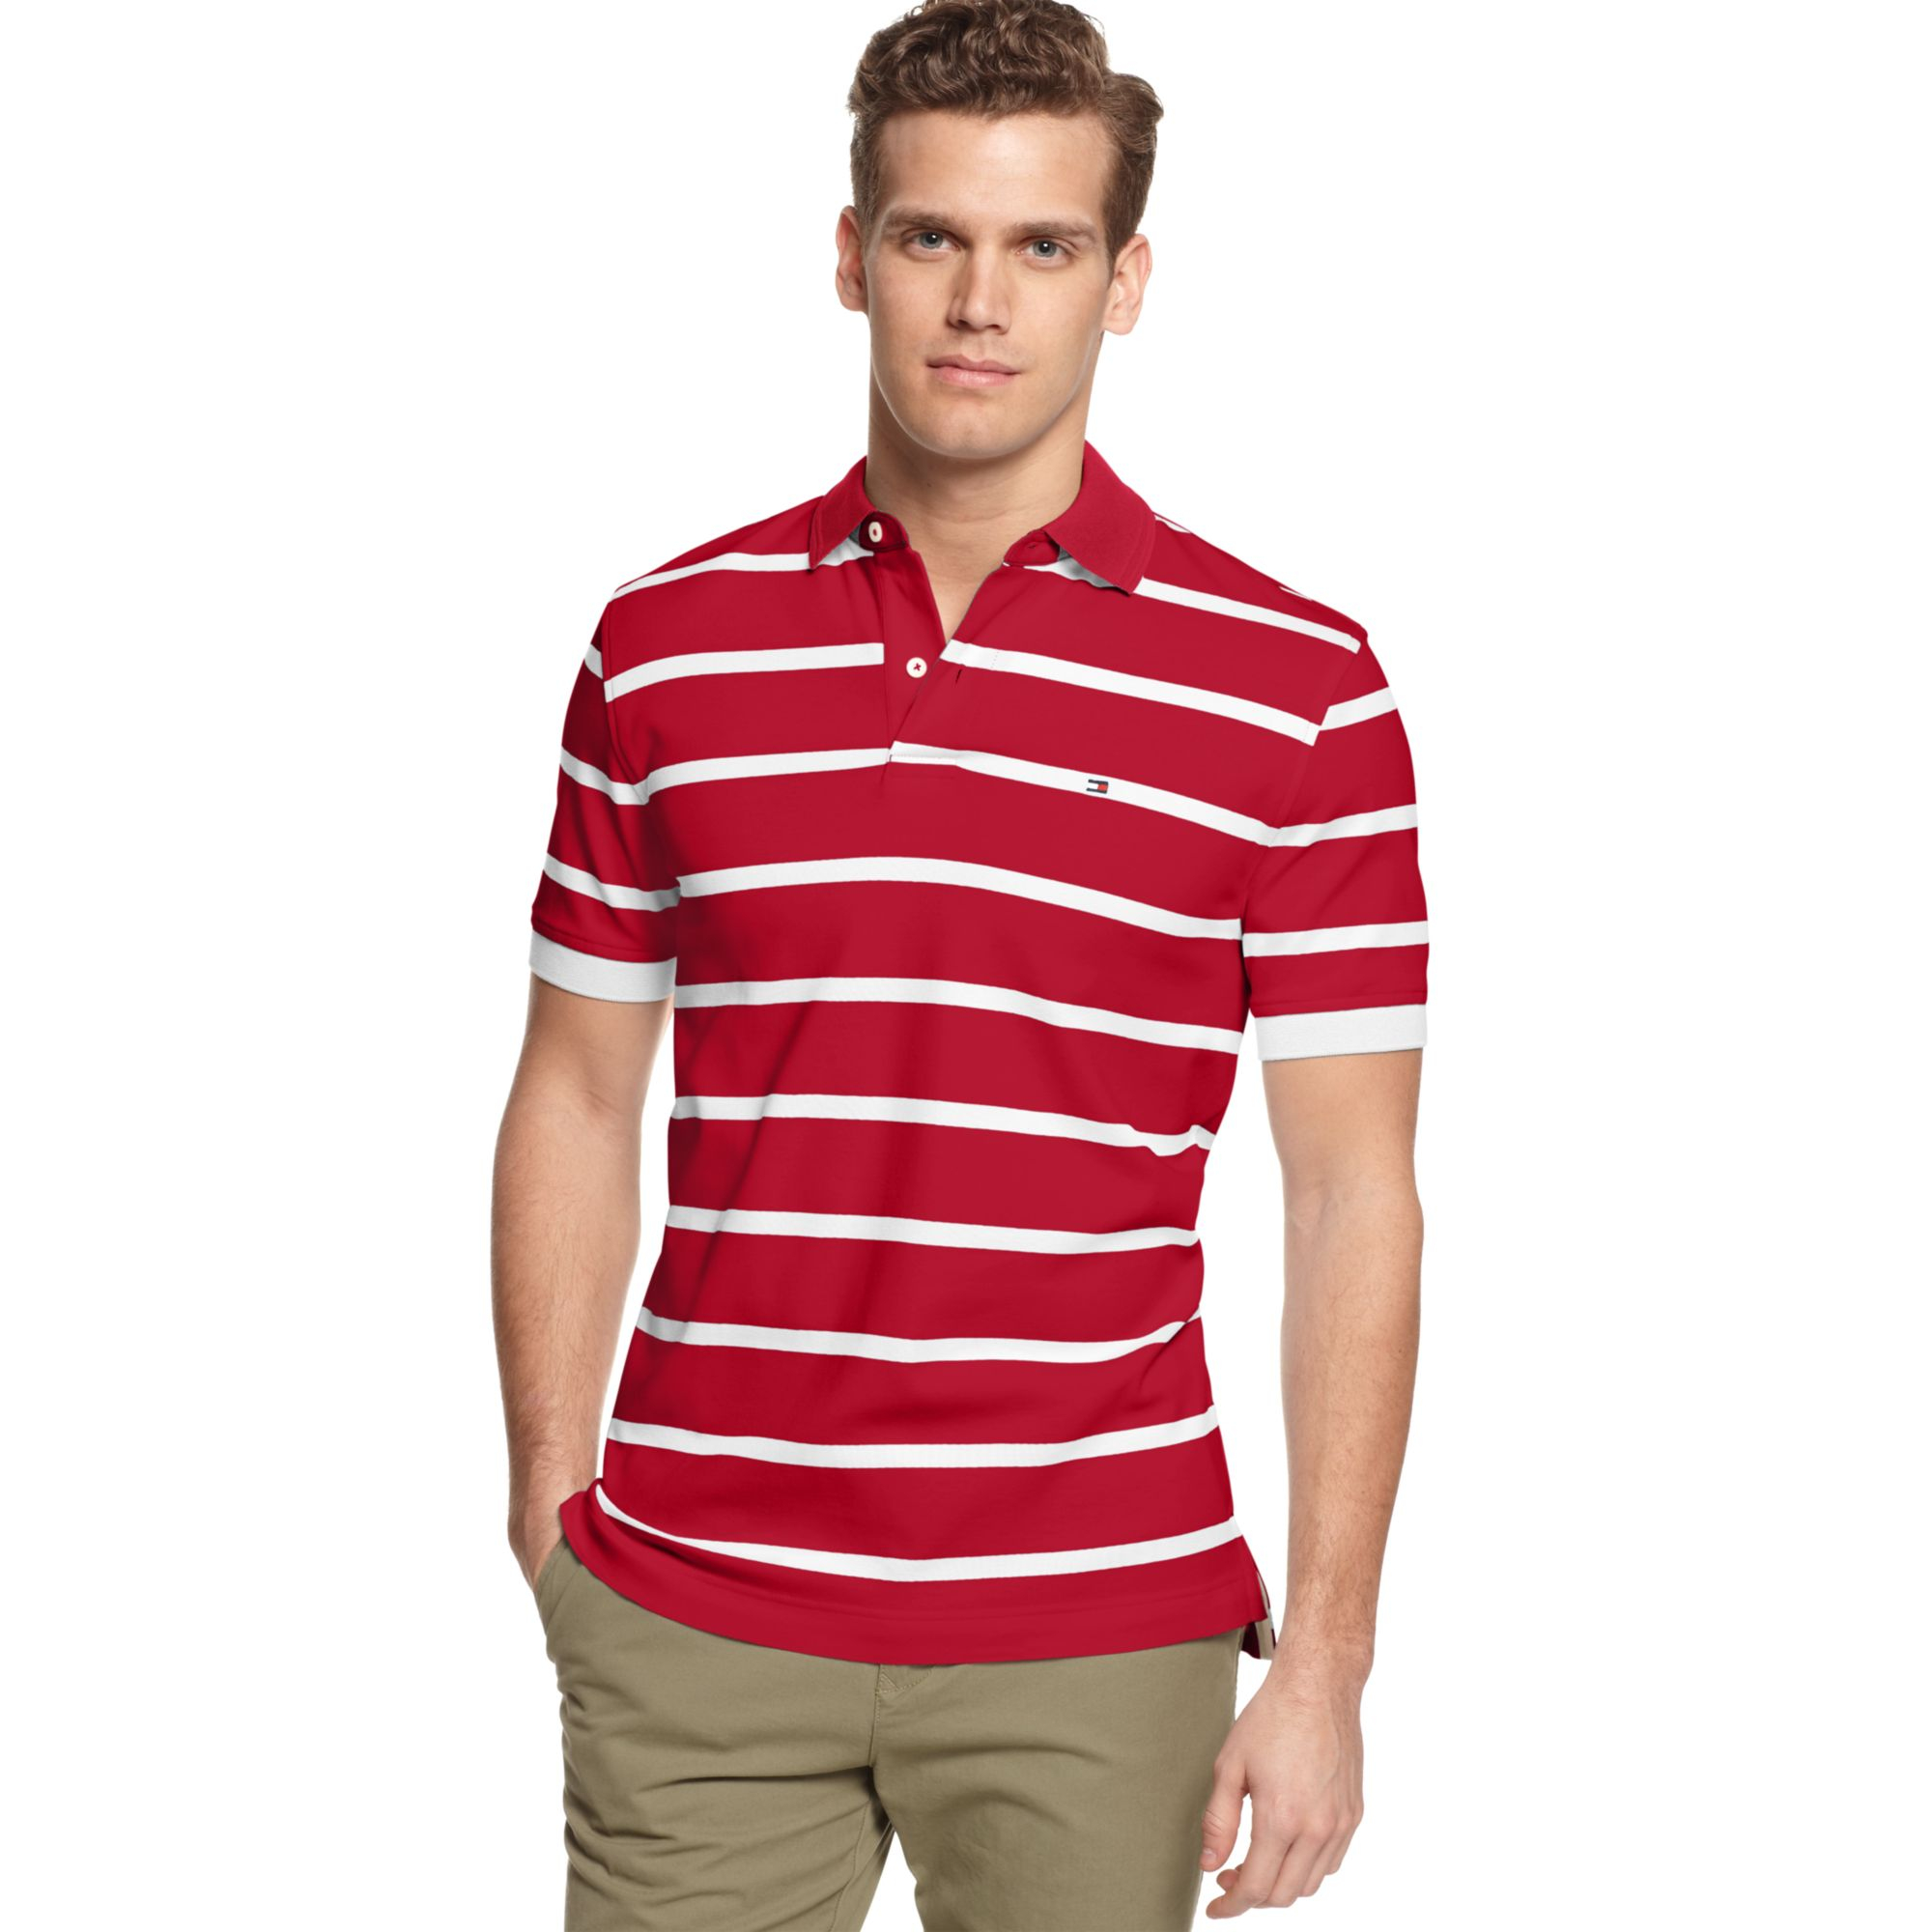 tommy hilfiger jackson striped polo shirt in red for men. Black Bedroom Furniture Sets. Home Design Ideas